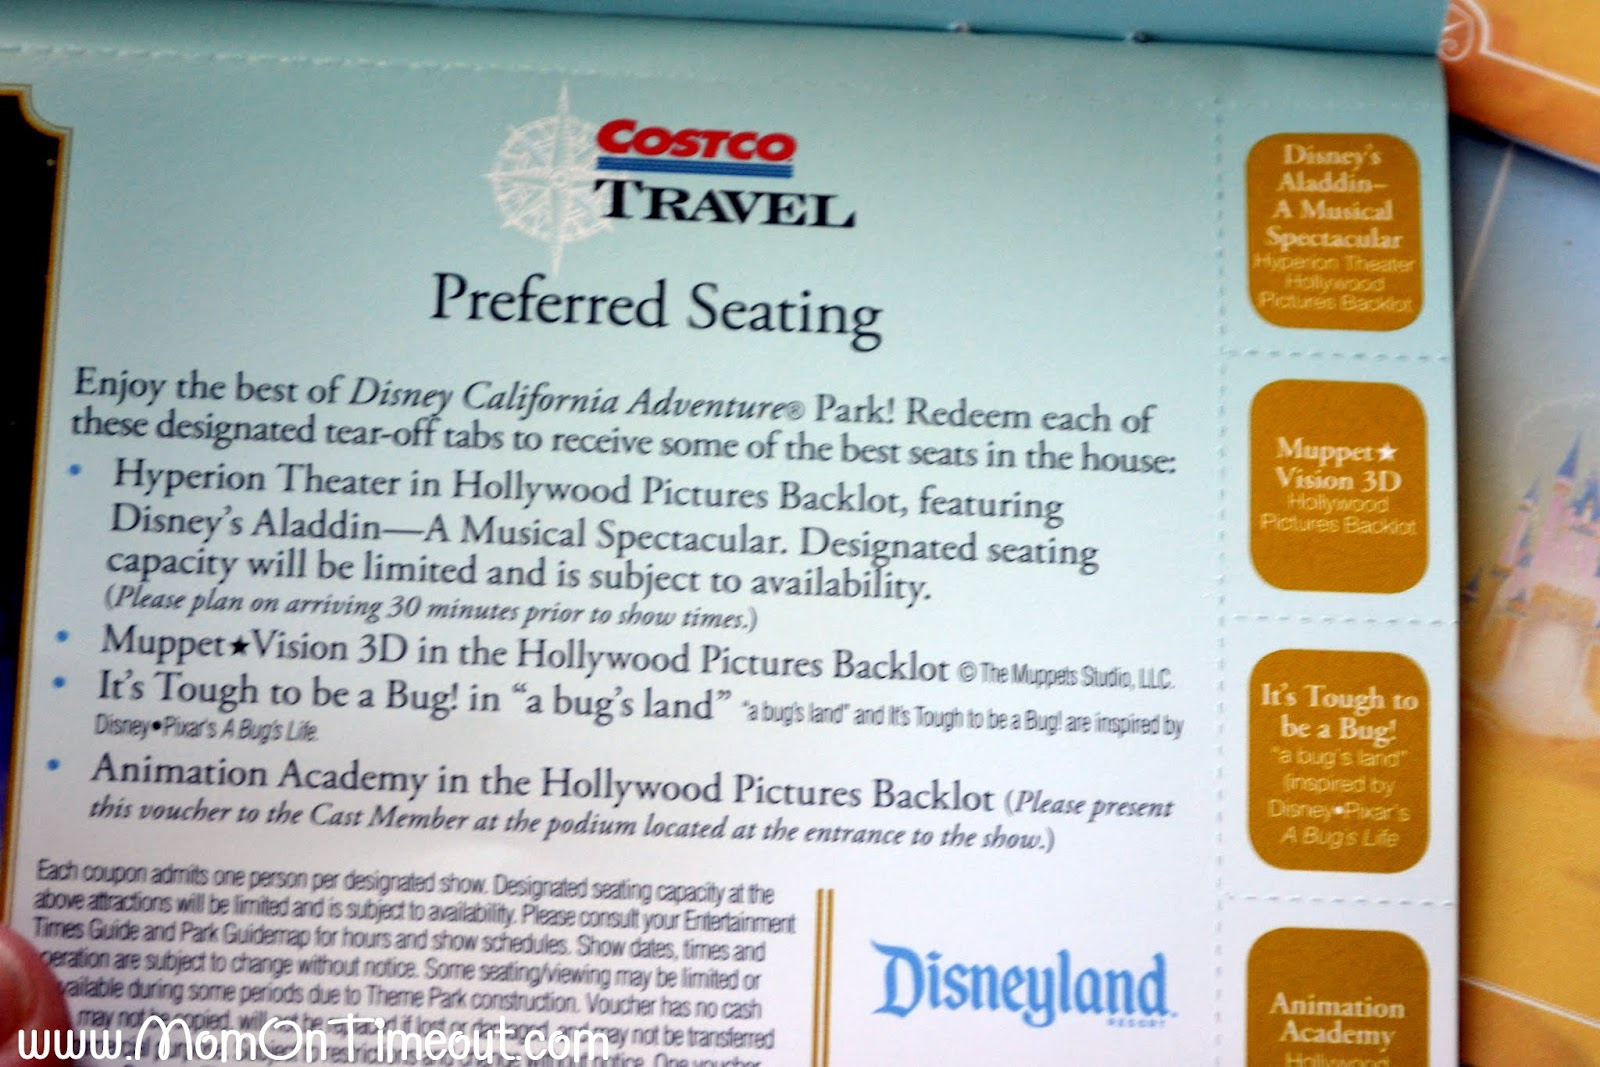 Disneyland discount coupons costco